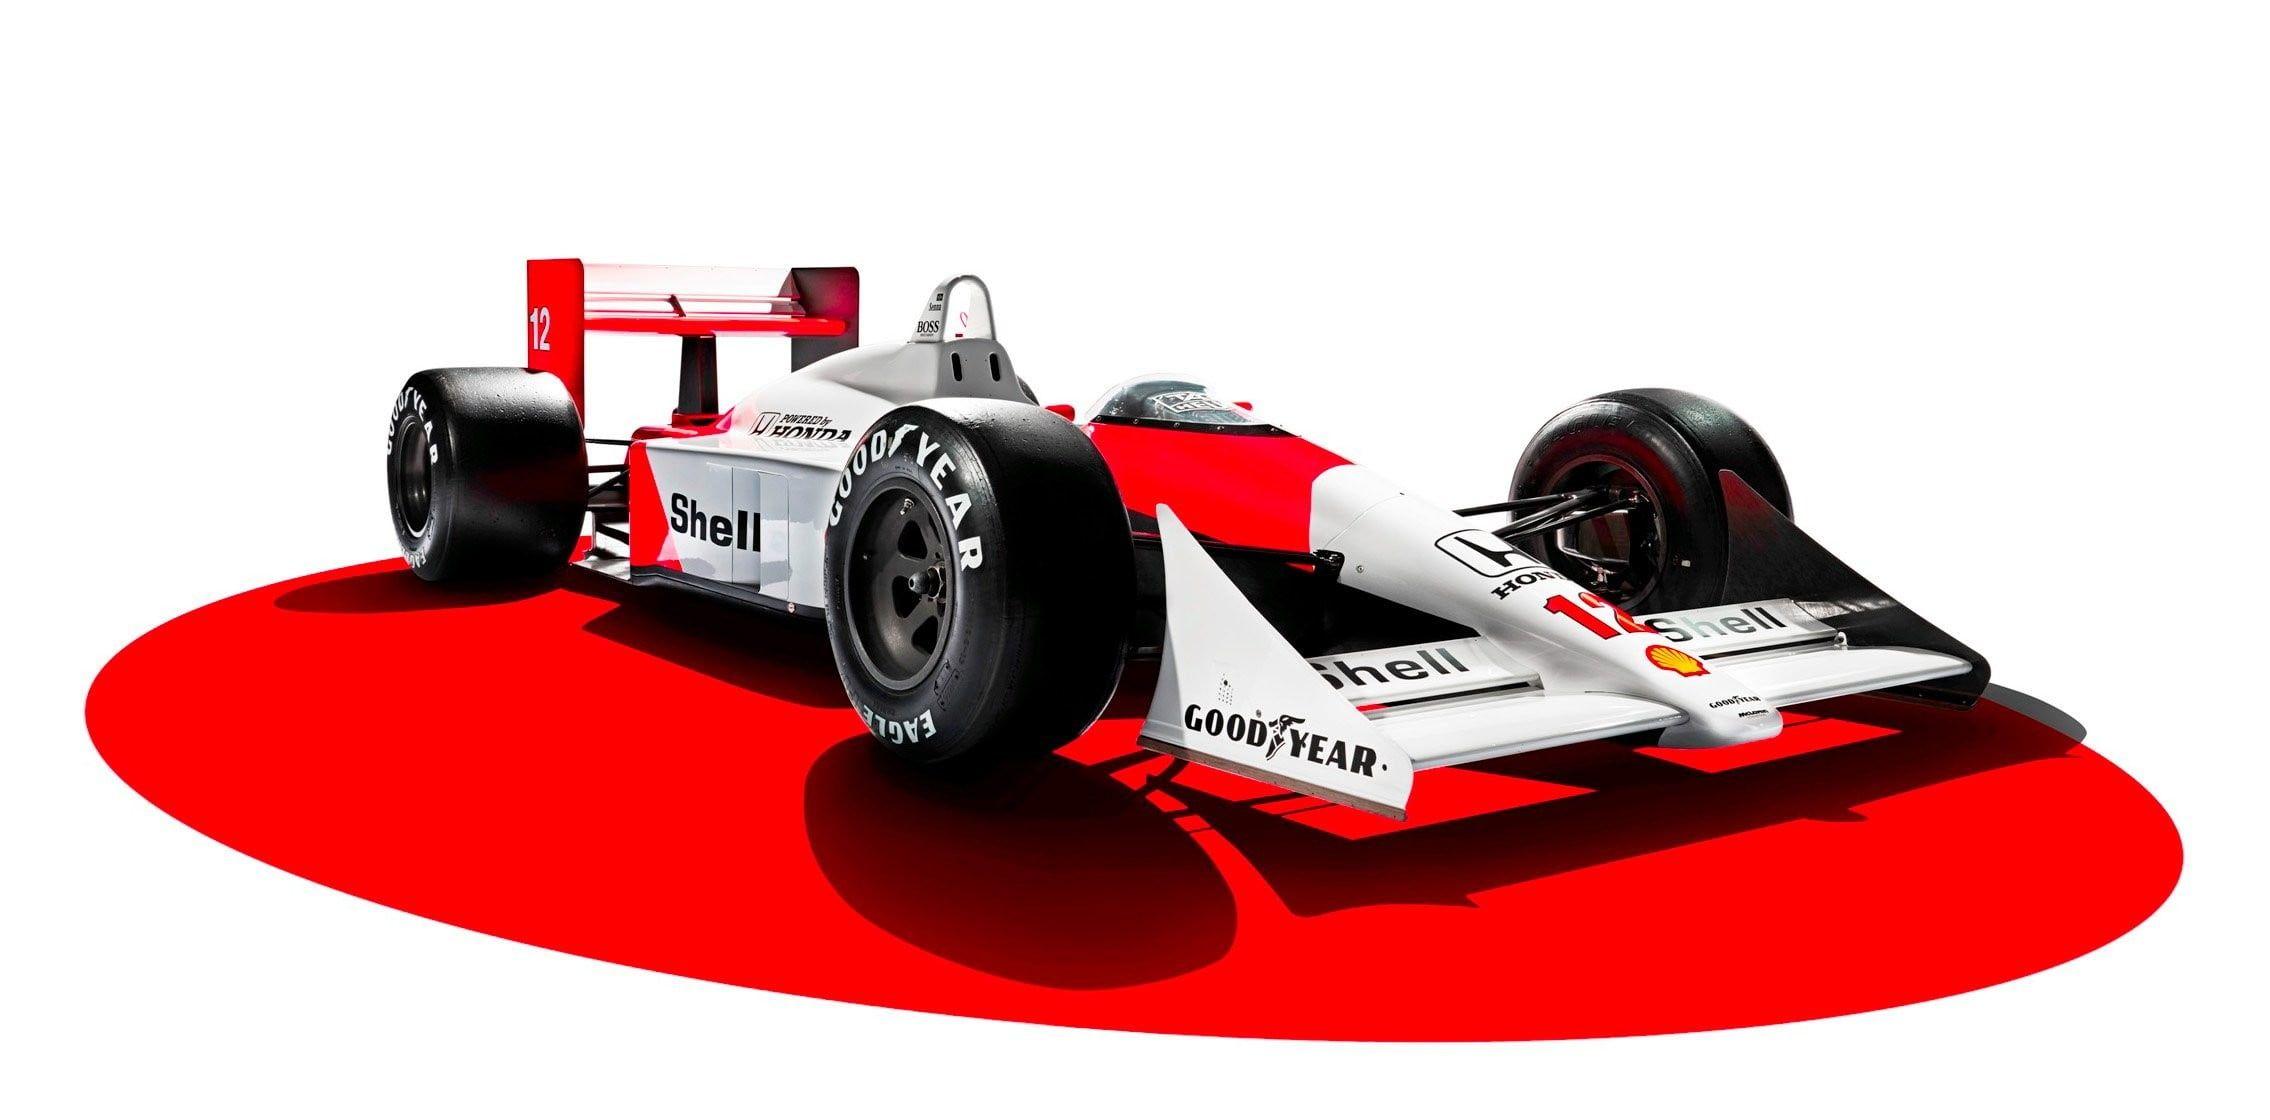 Red And White F1 Car Race Cars Formula 1 Mclaren F1 Honda Cgi Digital Art White Background Mclaren Mp4 4 1988 Ayrton Senna L In 2021 Racing Mclaren F1 Ayrton Senna